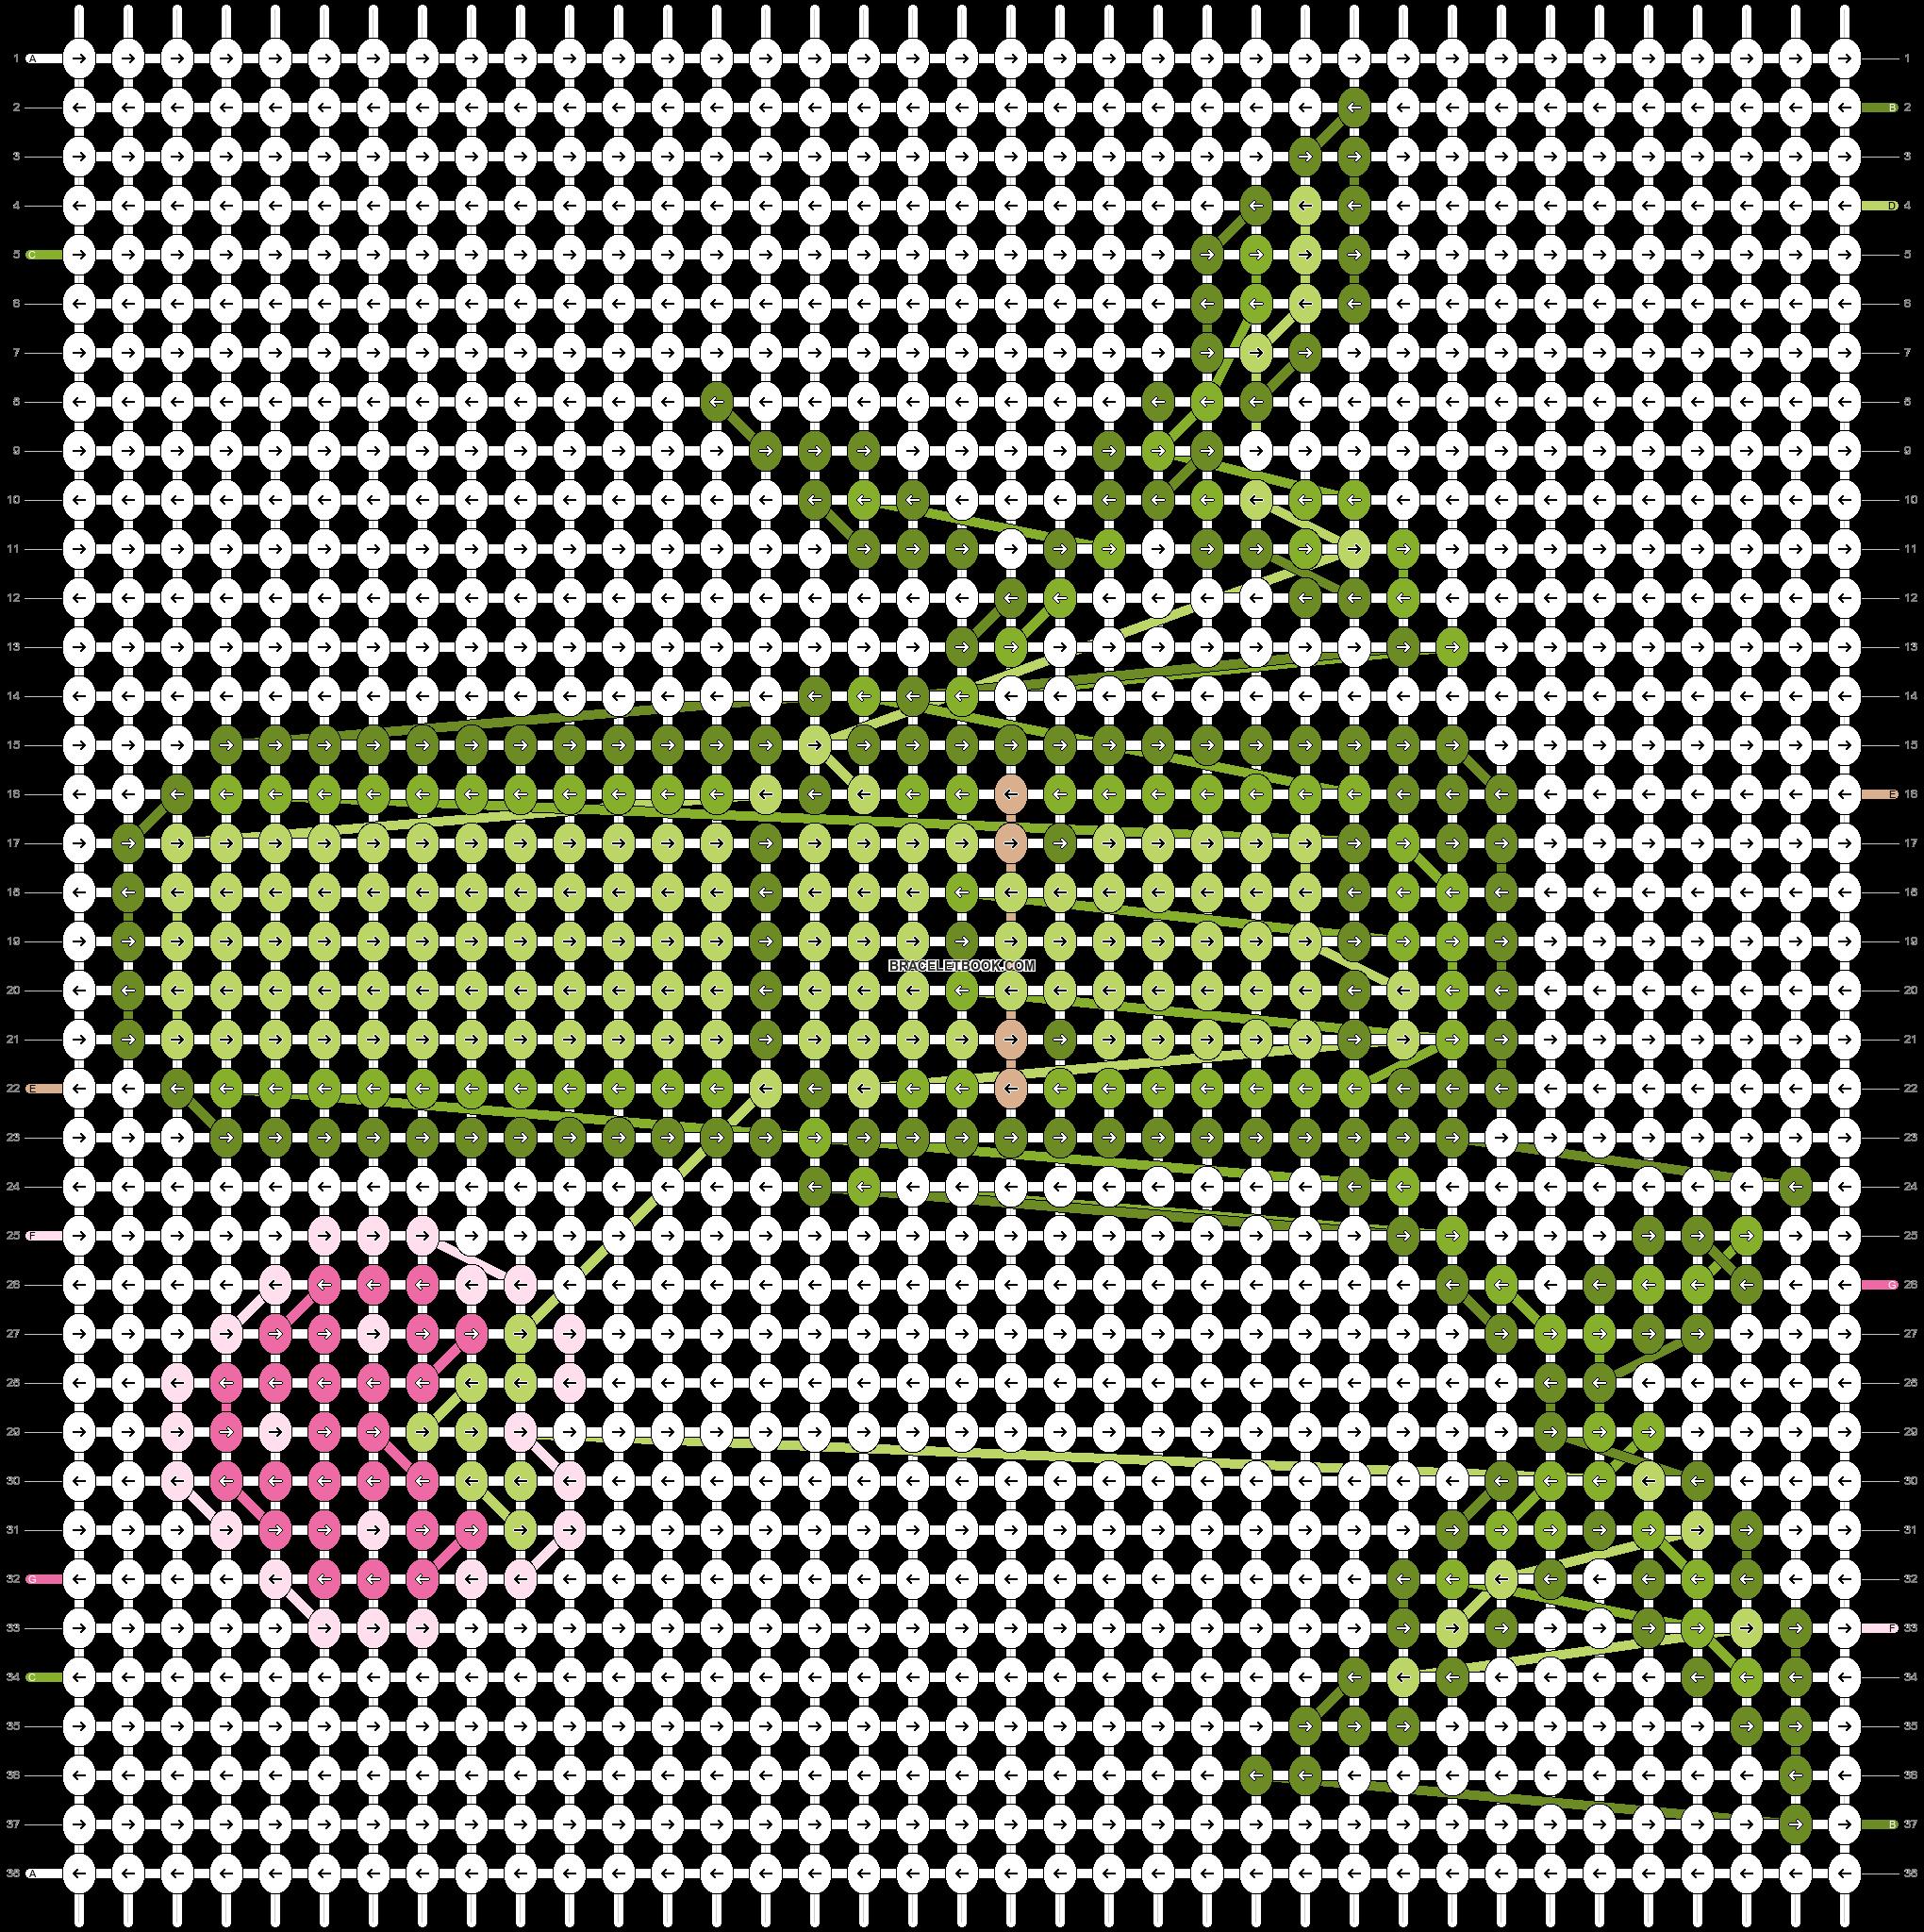 Alpha pattern #523 pattern